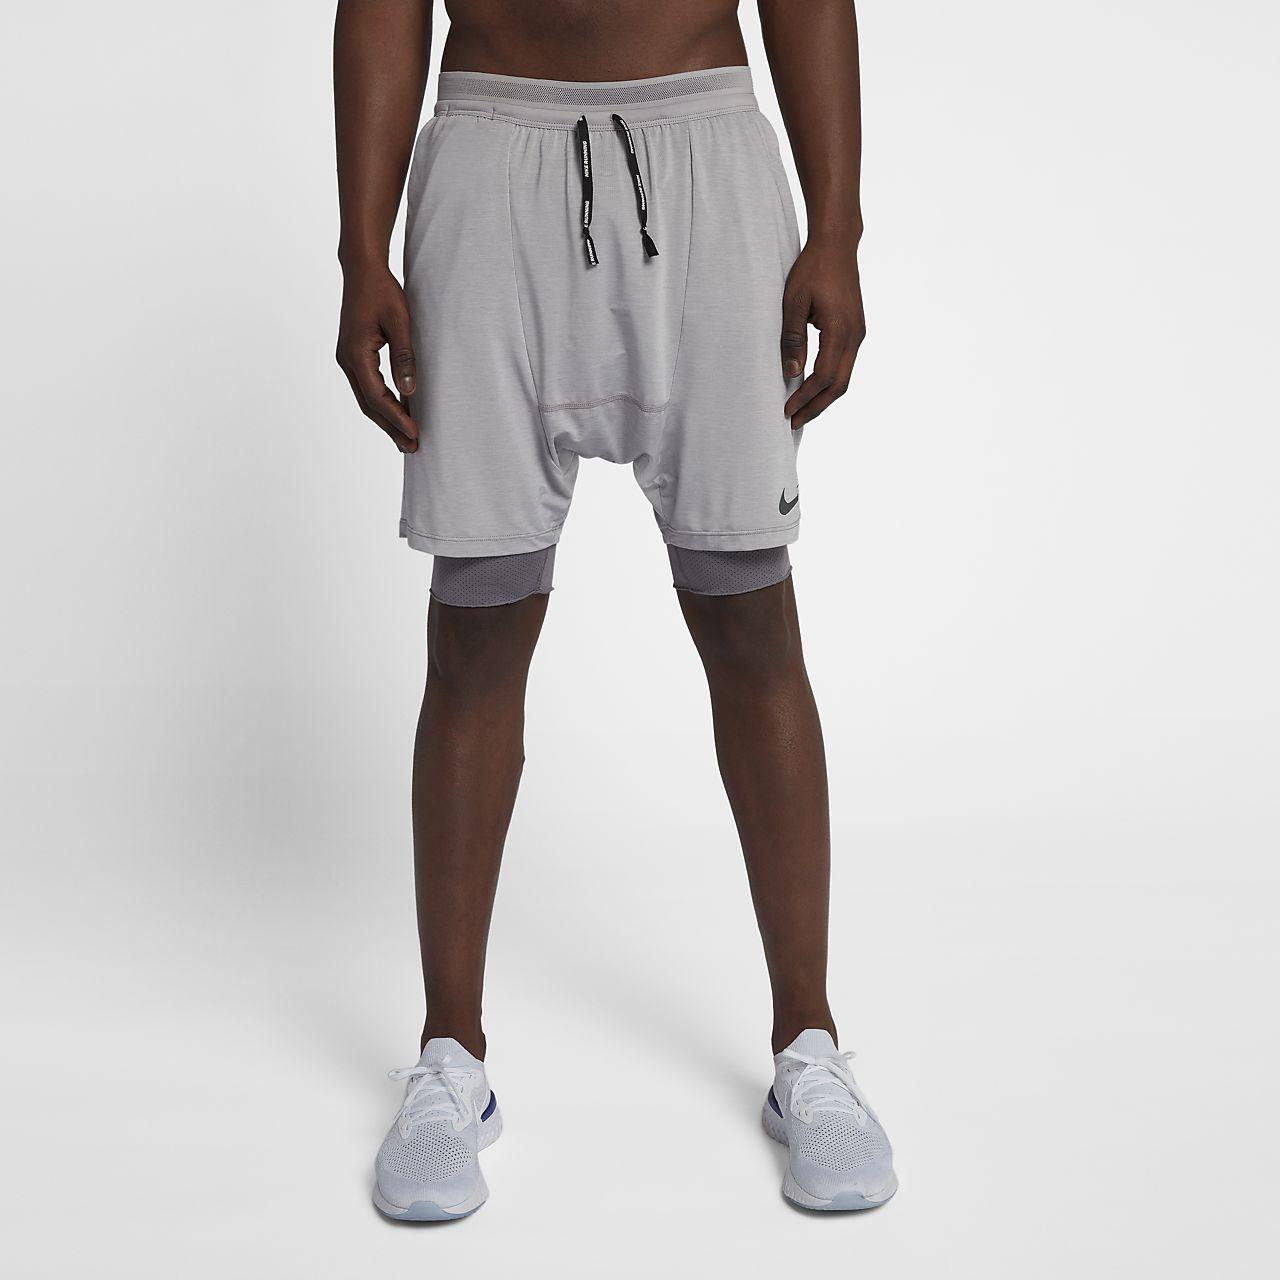 Nike Flex 2-in-1 Men's 7